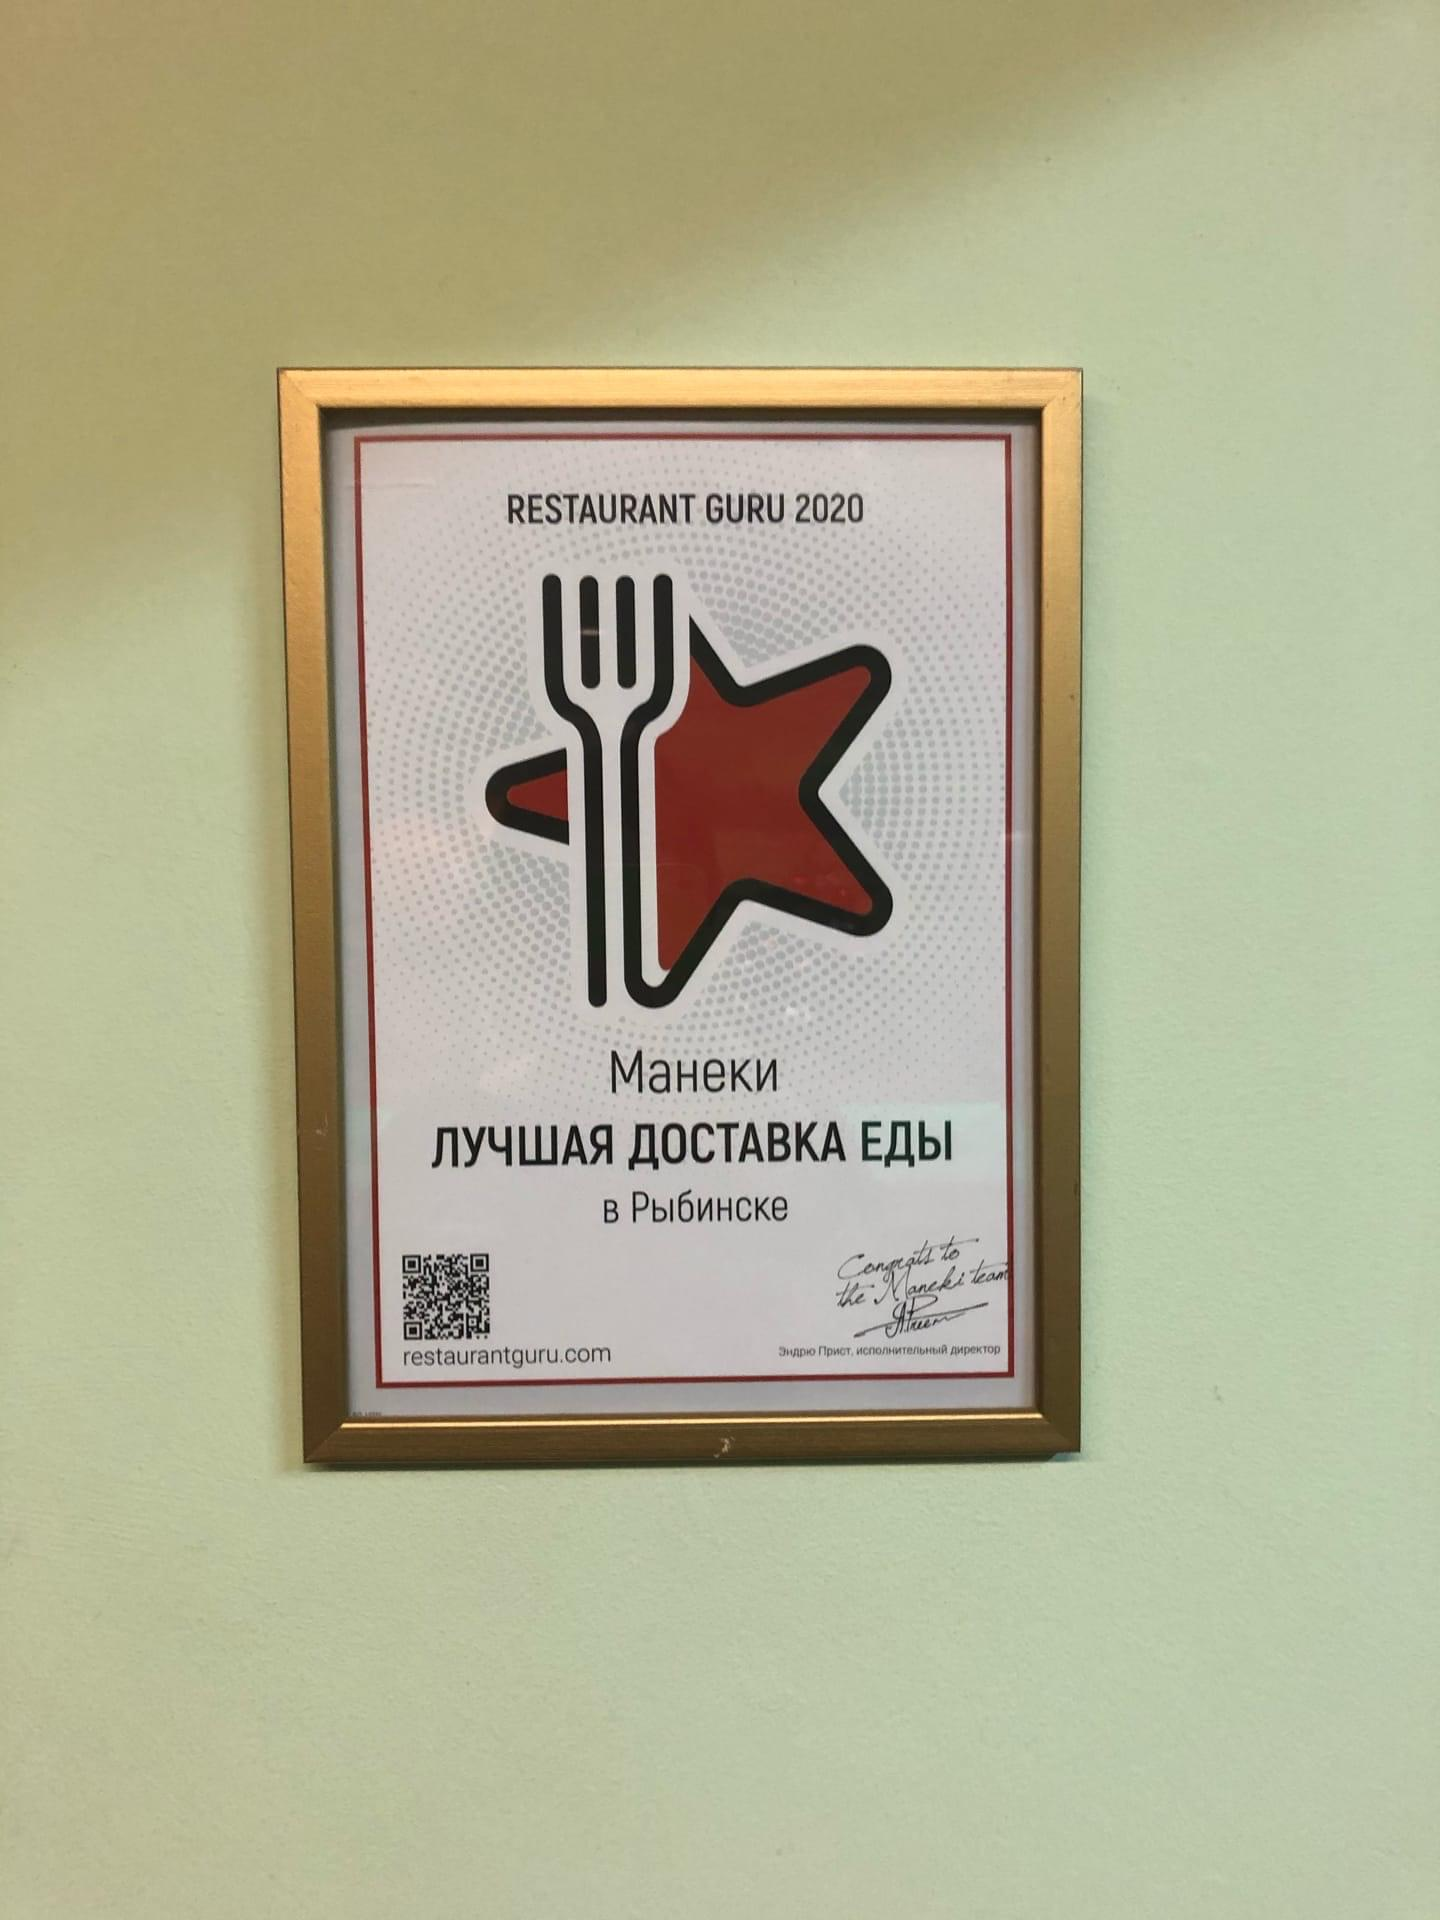 Maneki award